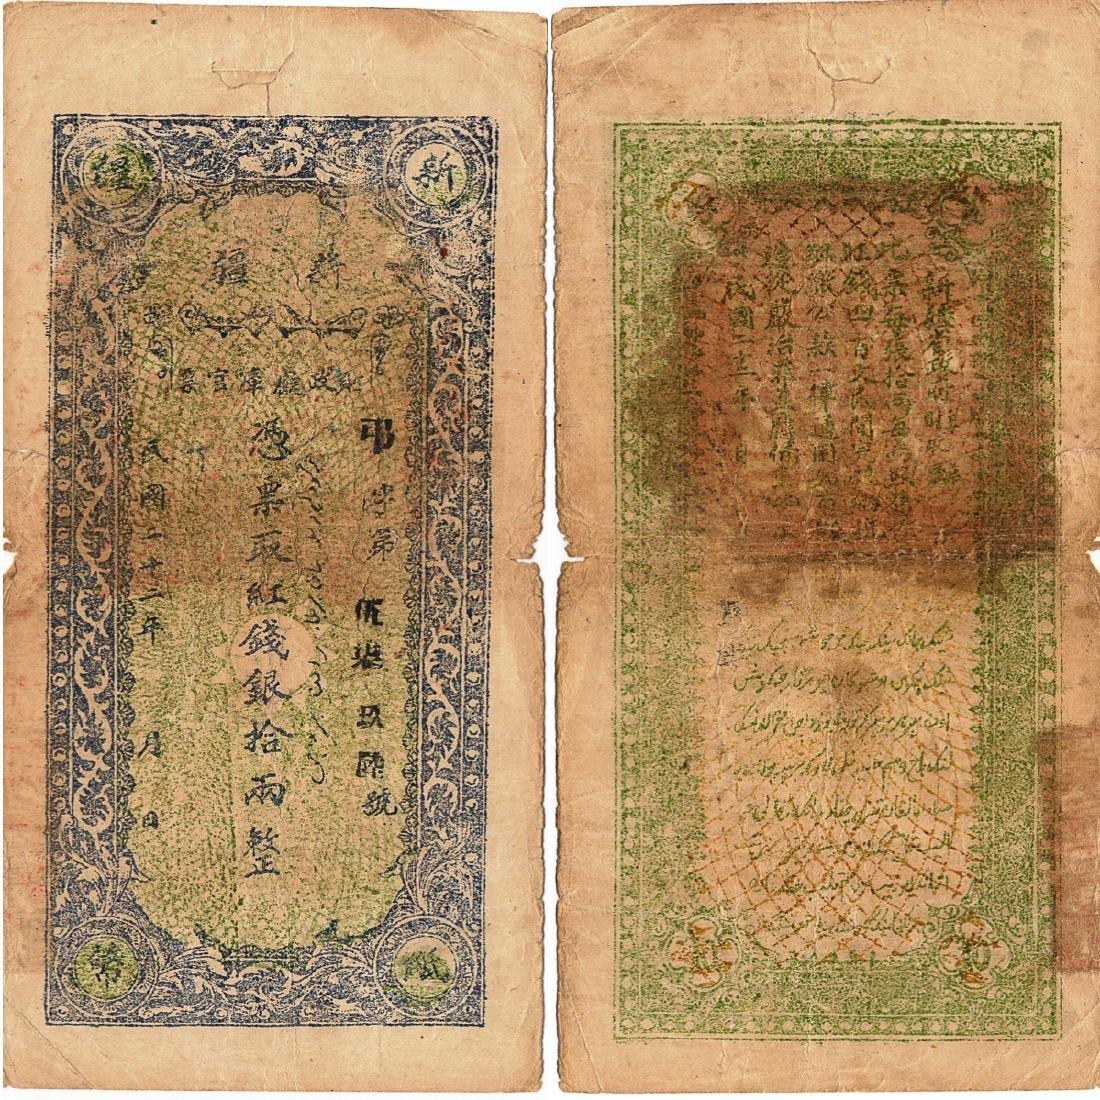 CHINA. 10 TAEL SINKIANG FINANCE DEPARTMENT TREASURY